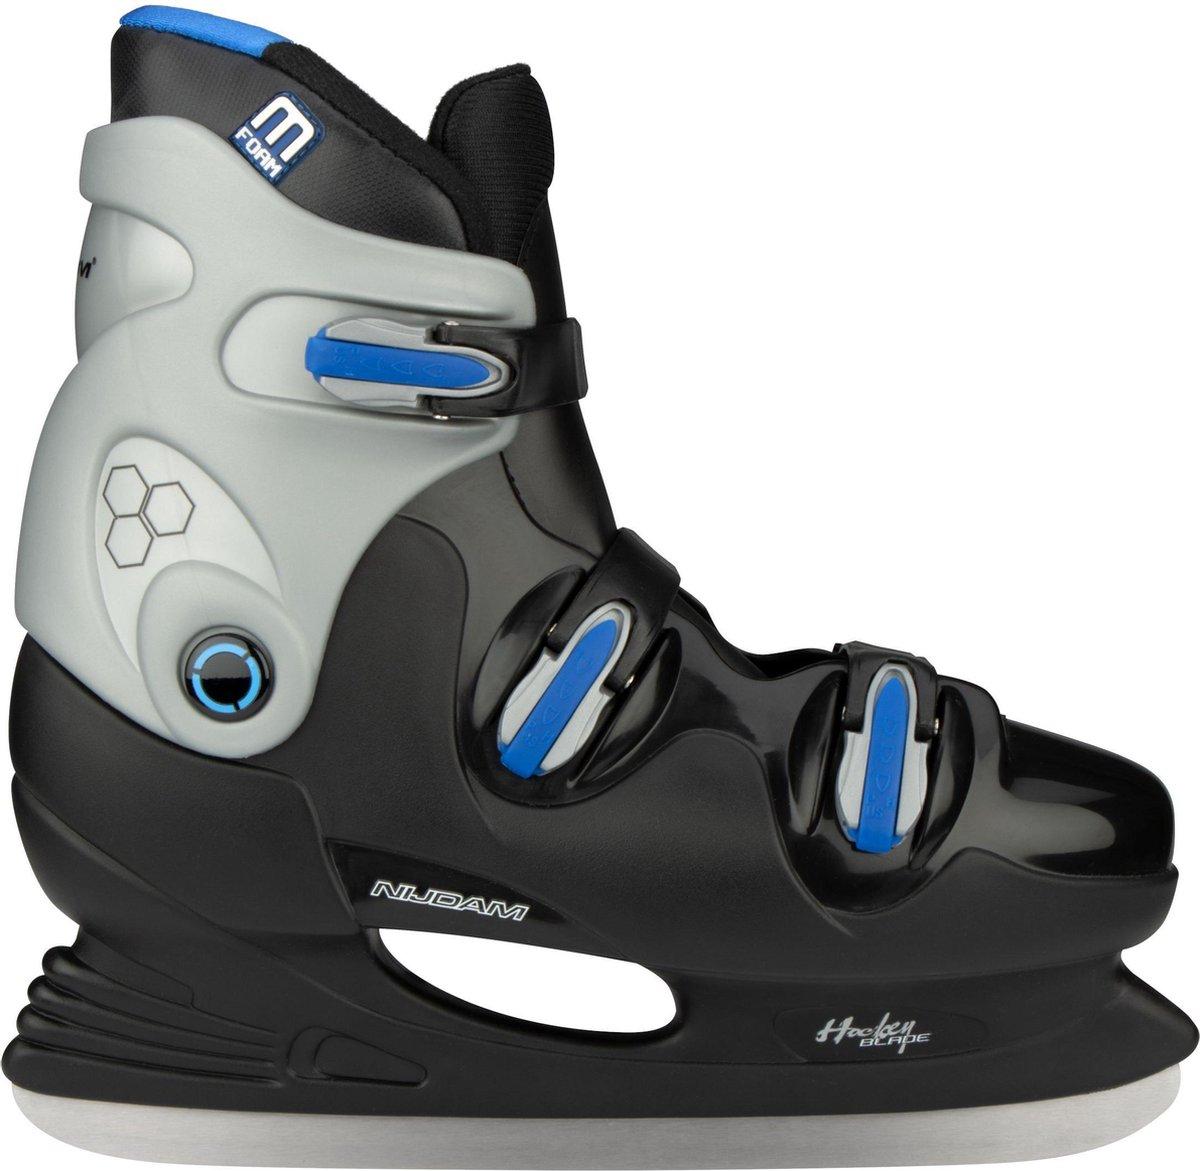 Nijdam IJshockeyschaats - Hardboot - Zwart/Blauw - Maat 46